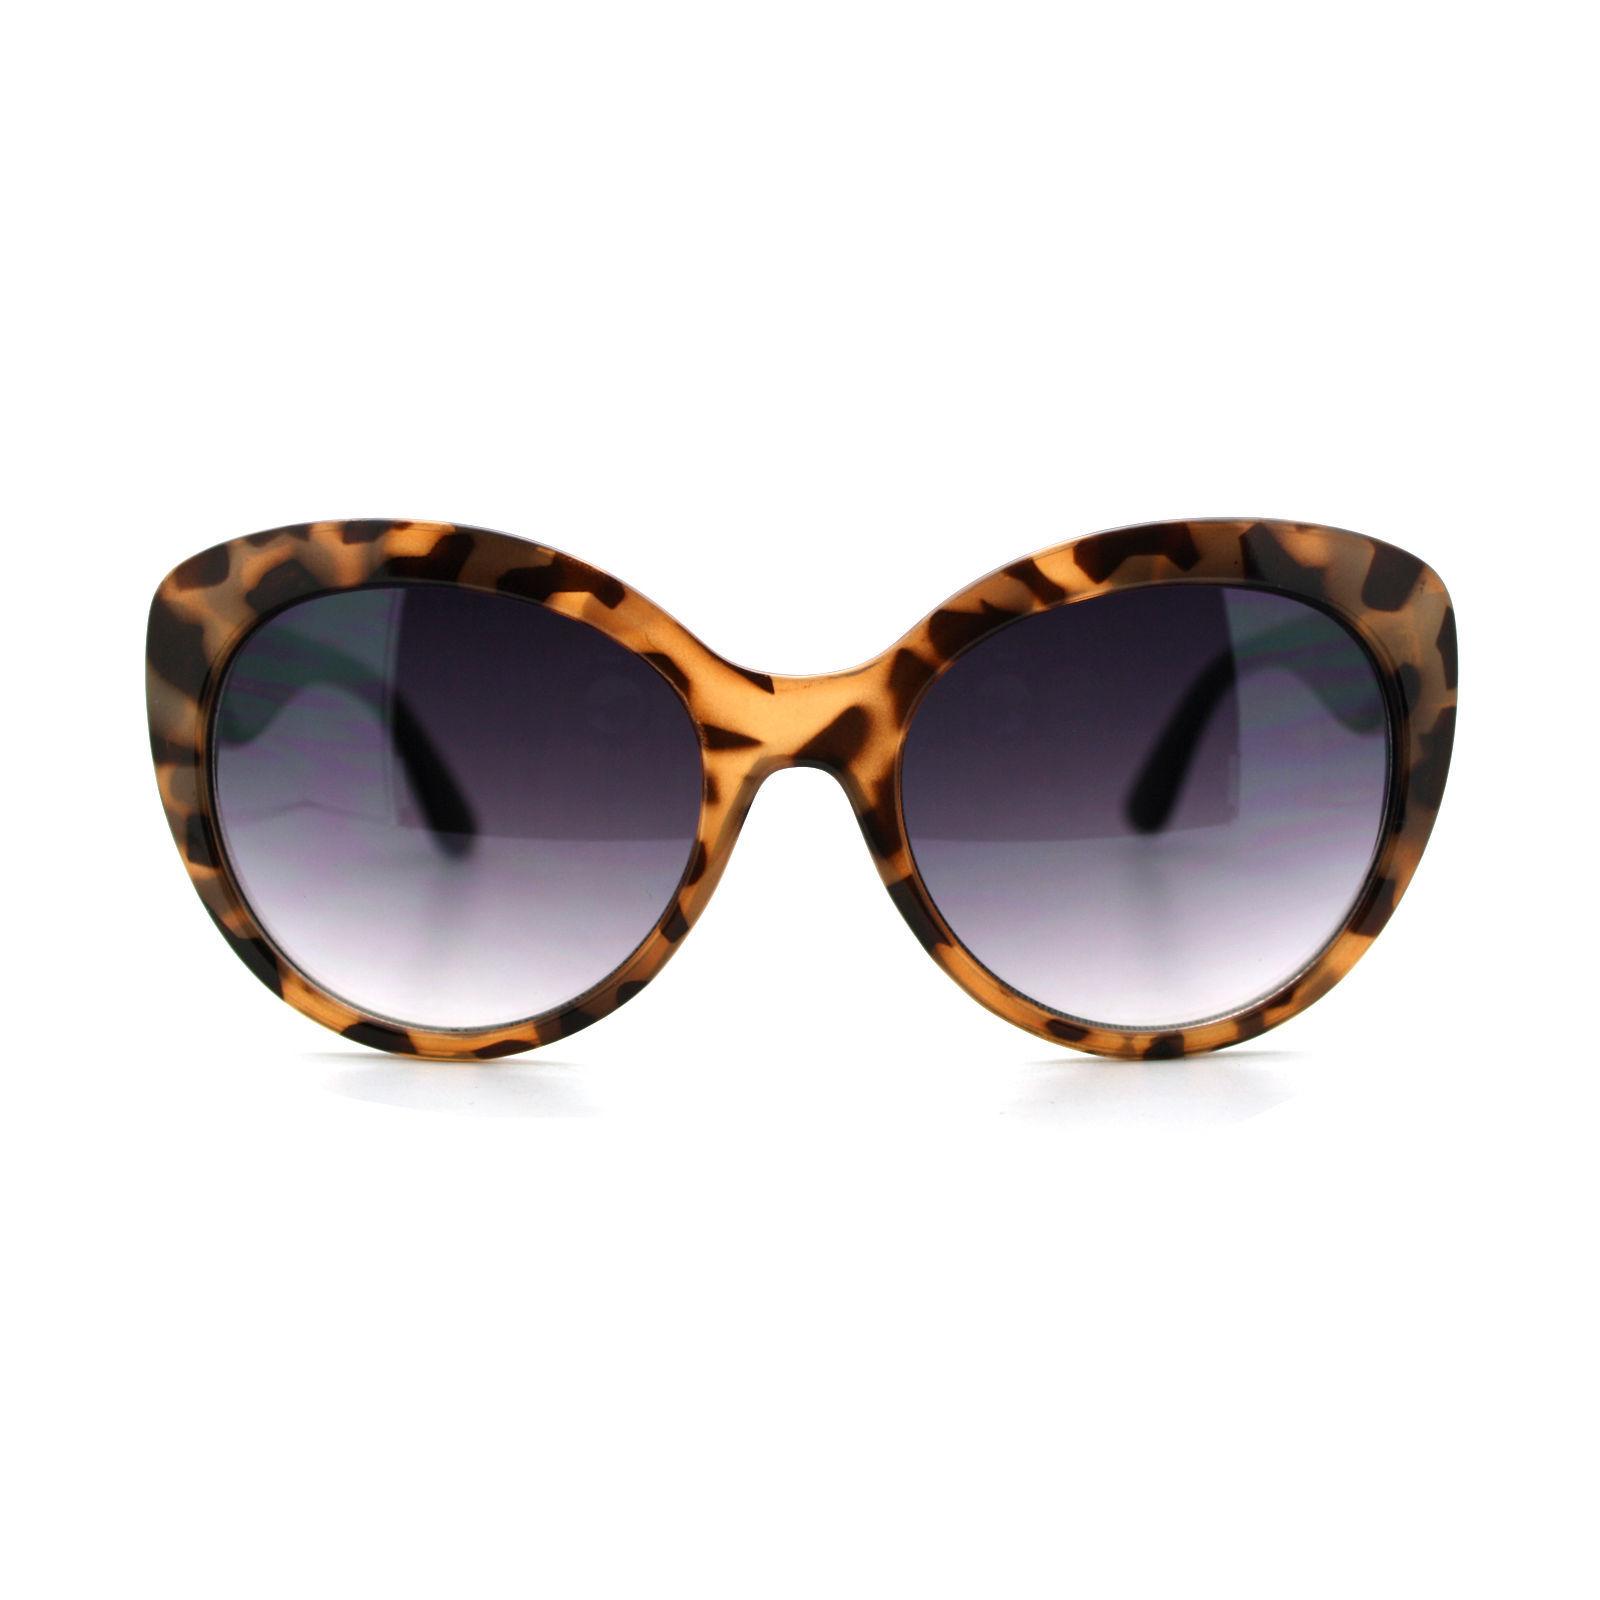 Womens Fashion Sunglasses Stylish Round Butterfly Frame